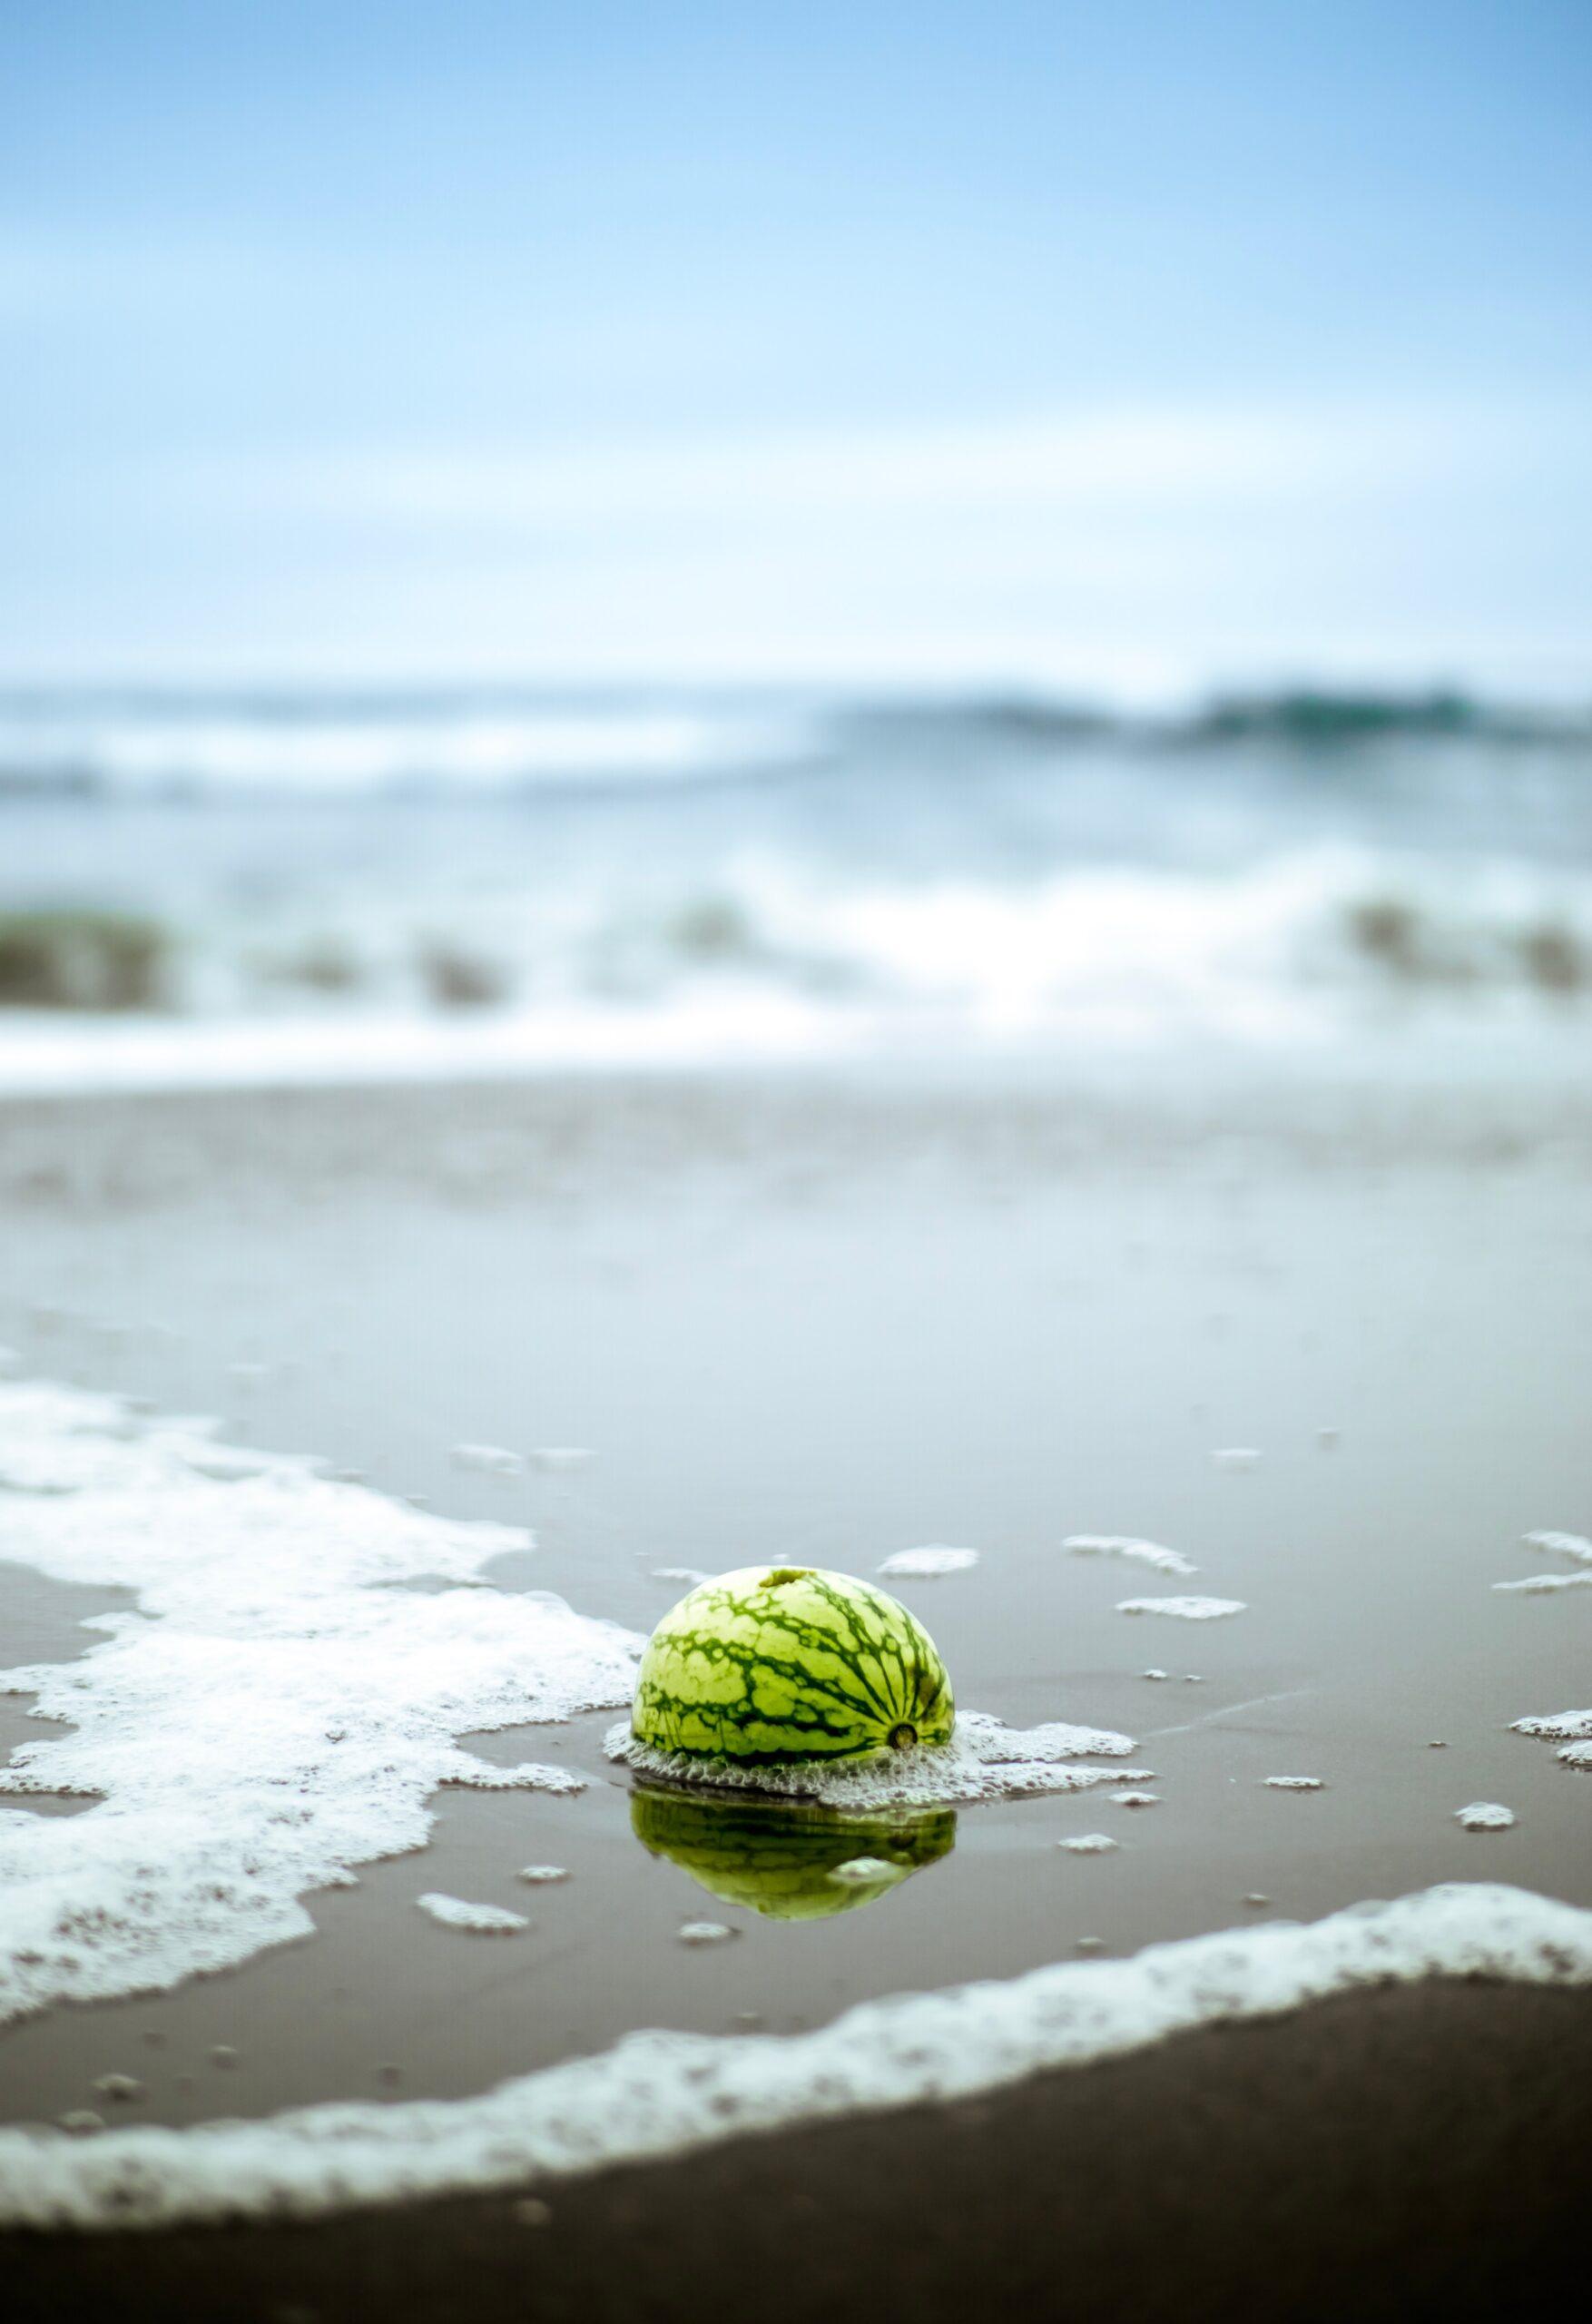 Watermelon washing ashore on ocean beach by william bout on Unsplash